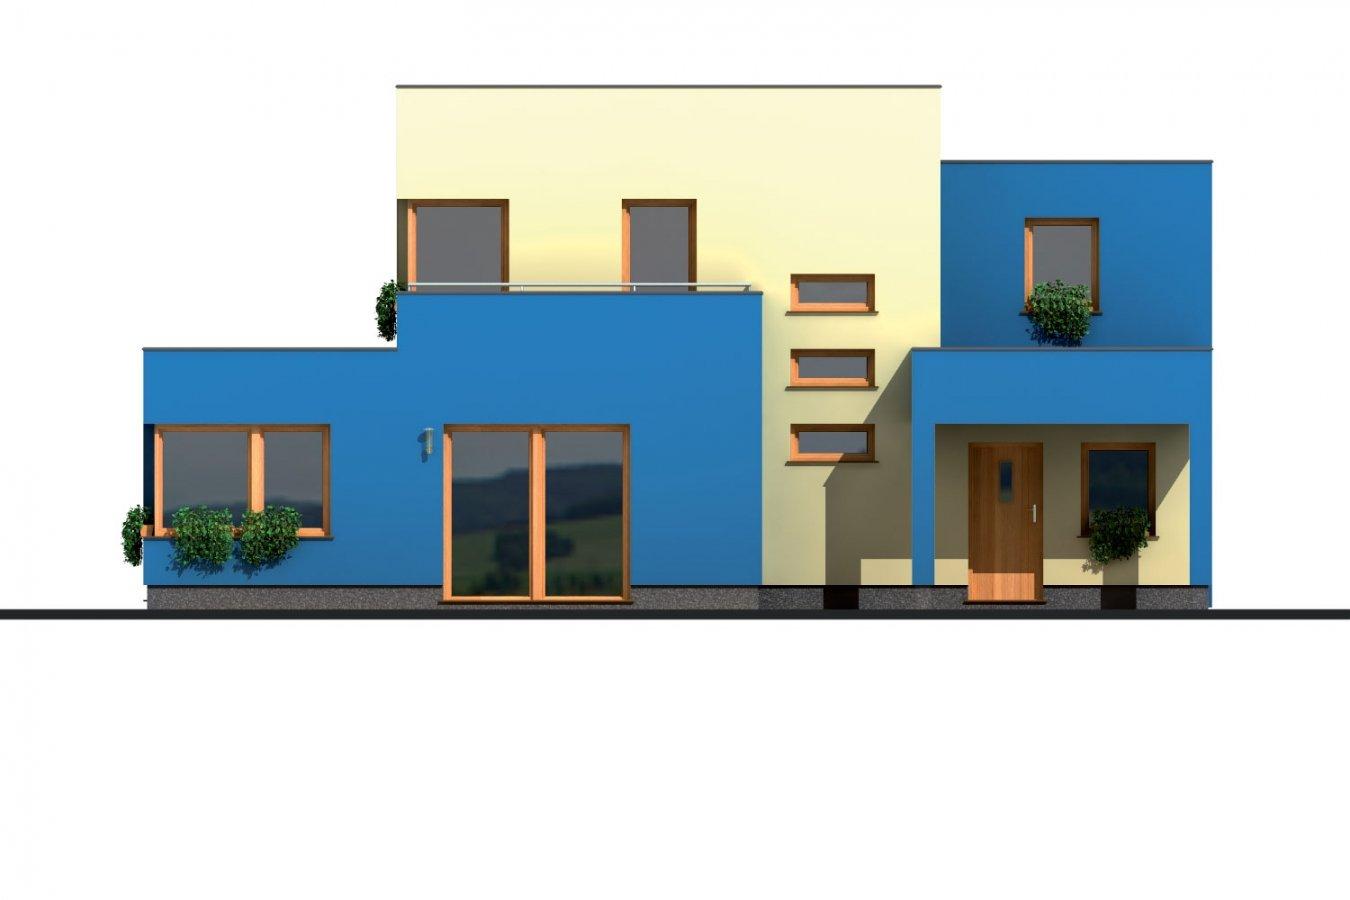 Pohľad 3. - Projekt moderného rodinného domu s plochou strechou a garážou